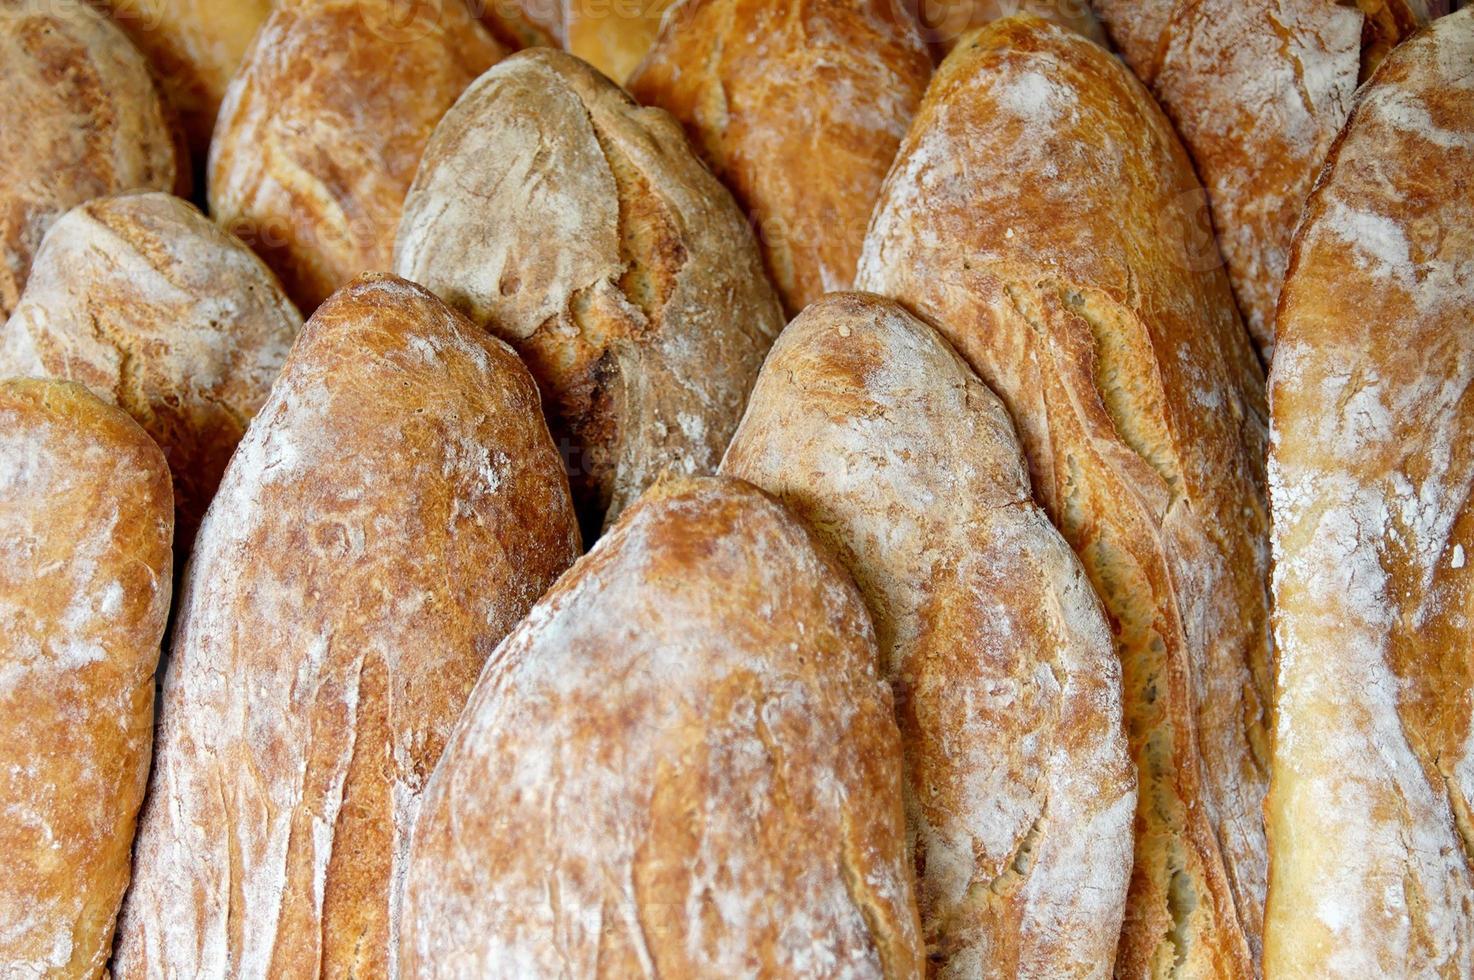 pane francese di grandi dimensioni foto